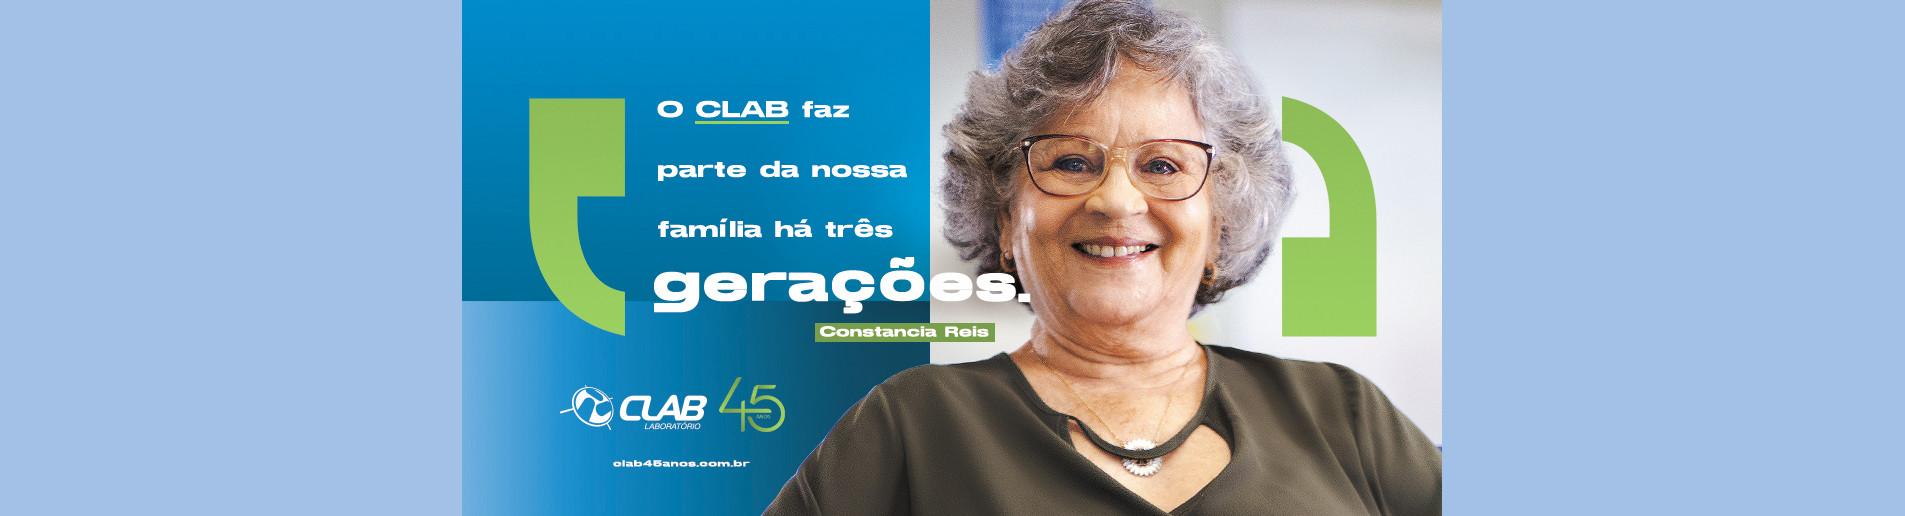 clab45anos